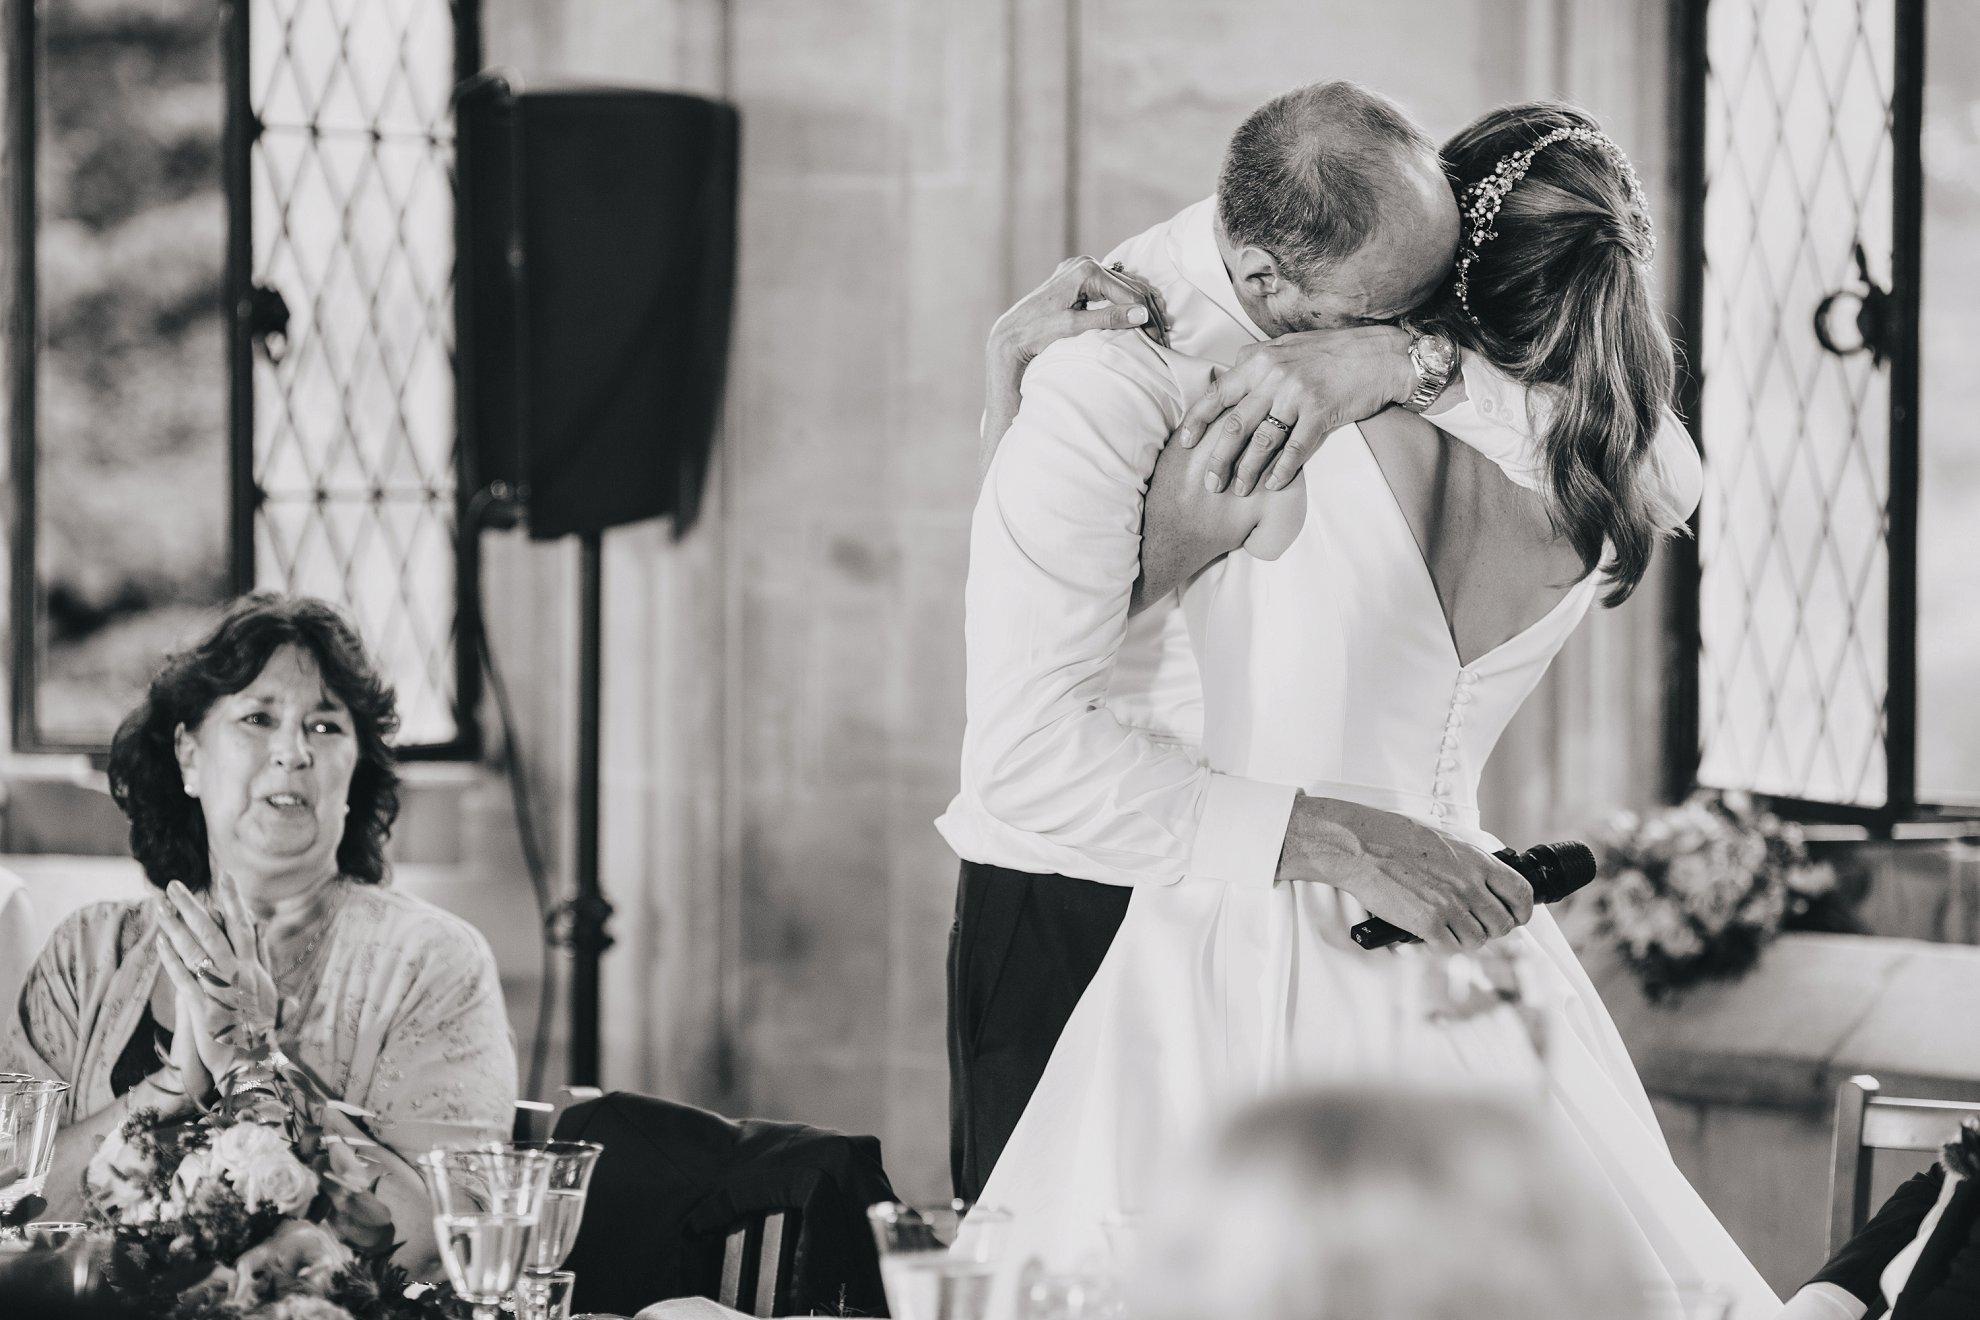 st donat's wedding